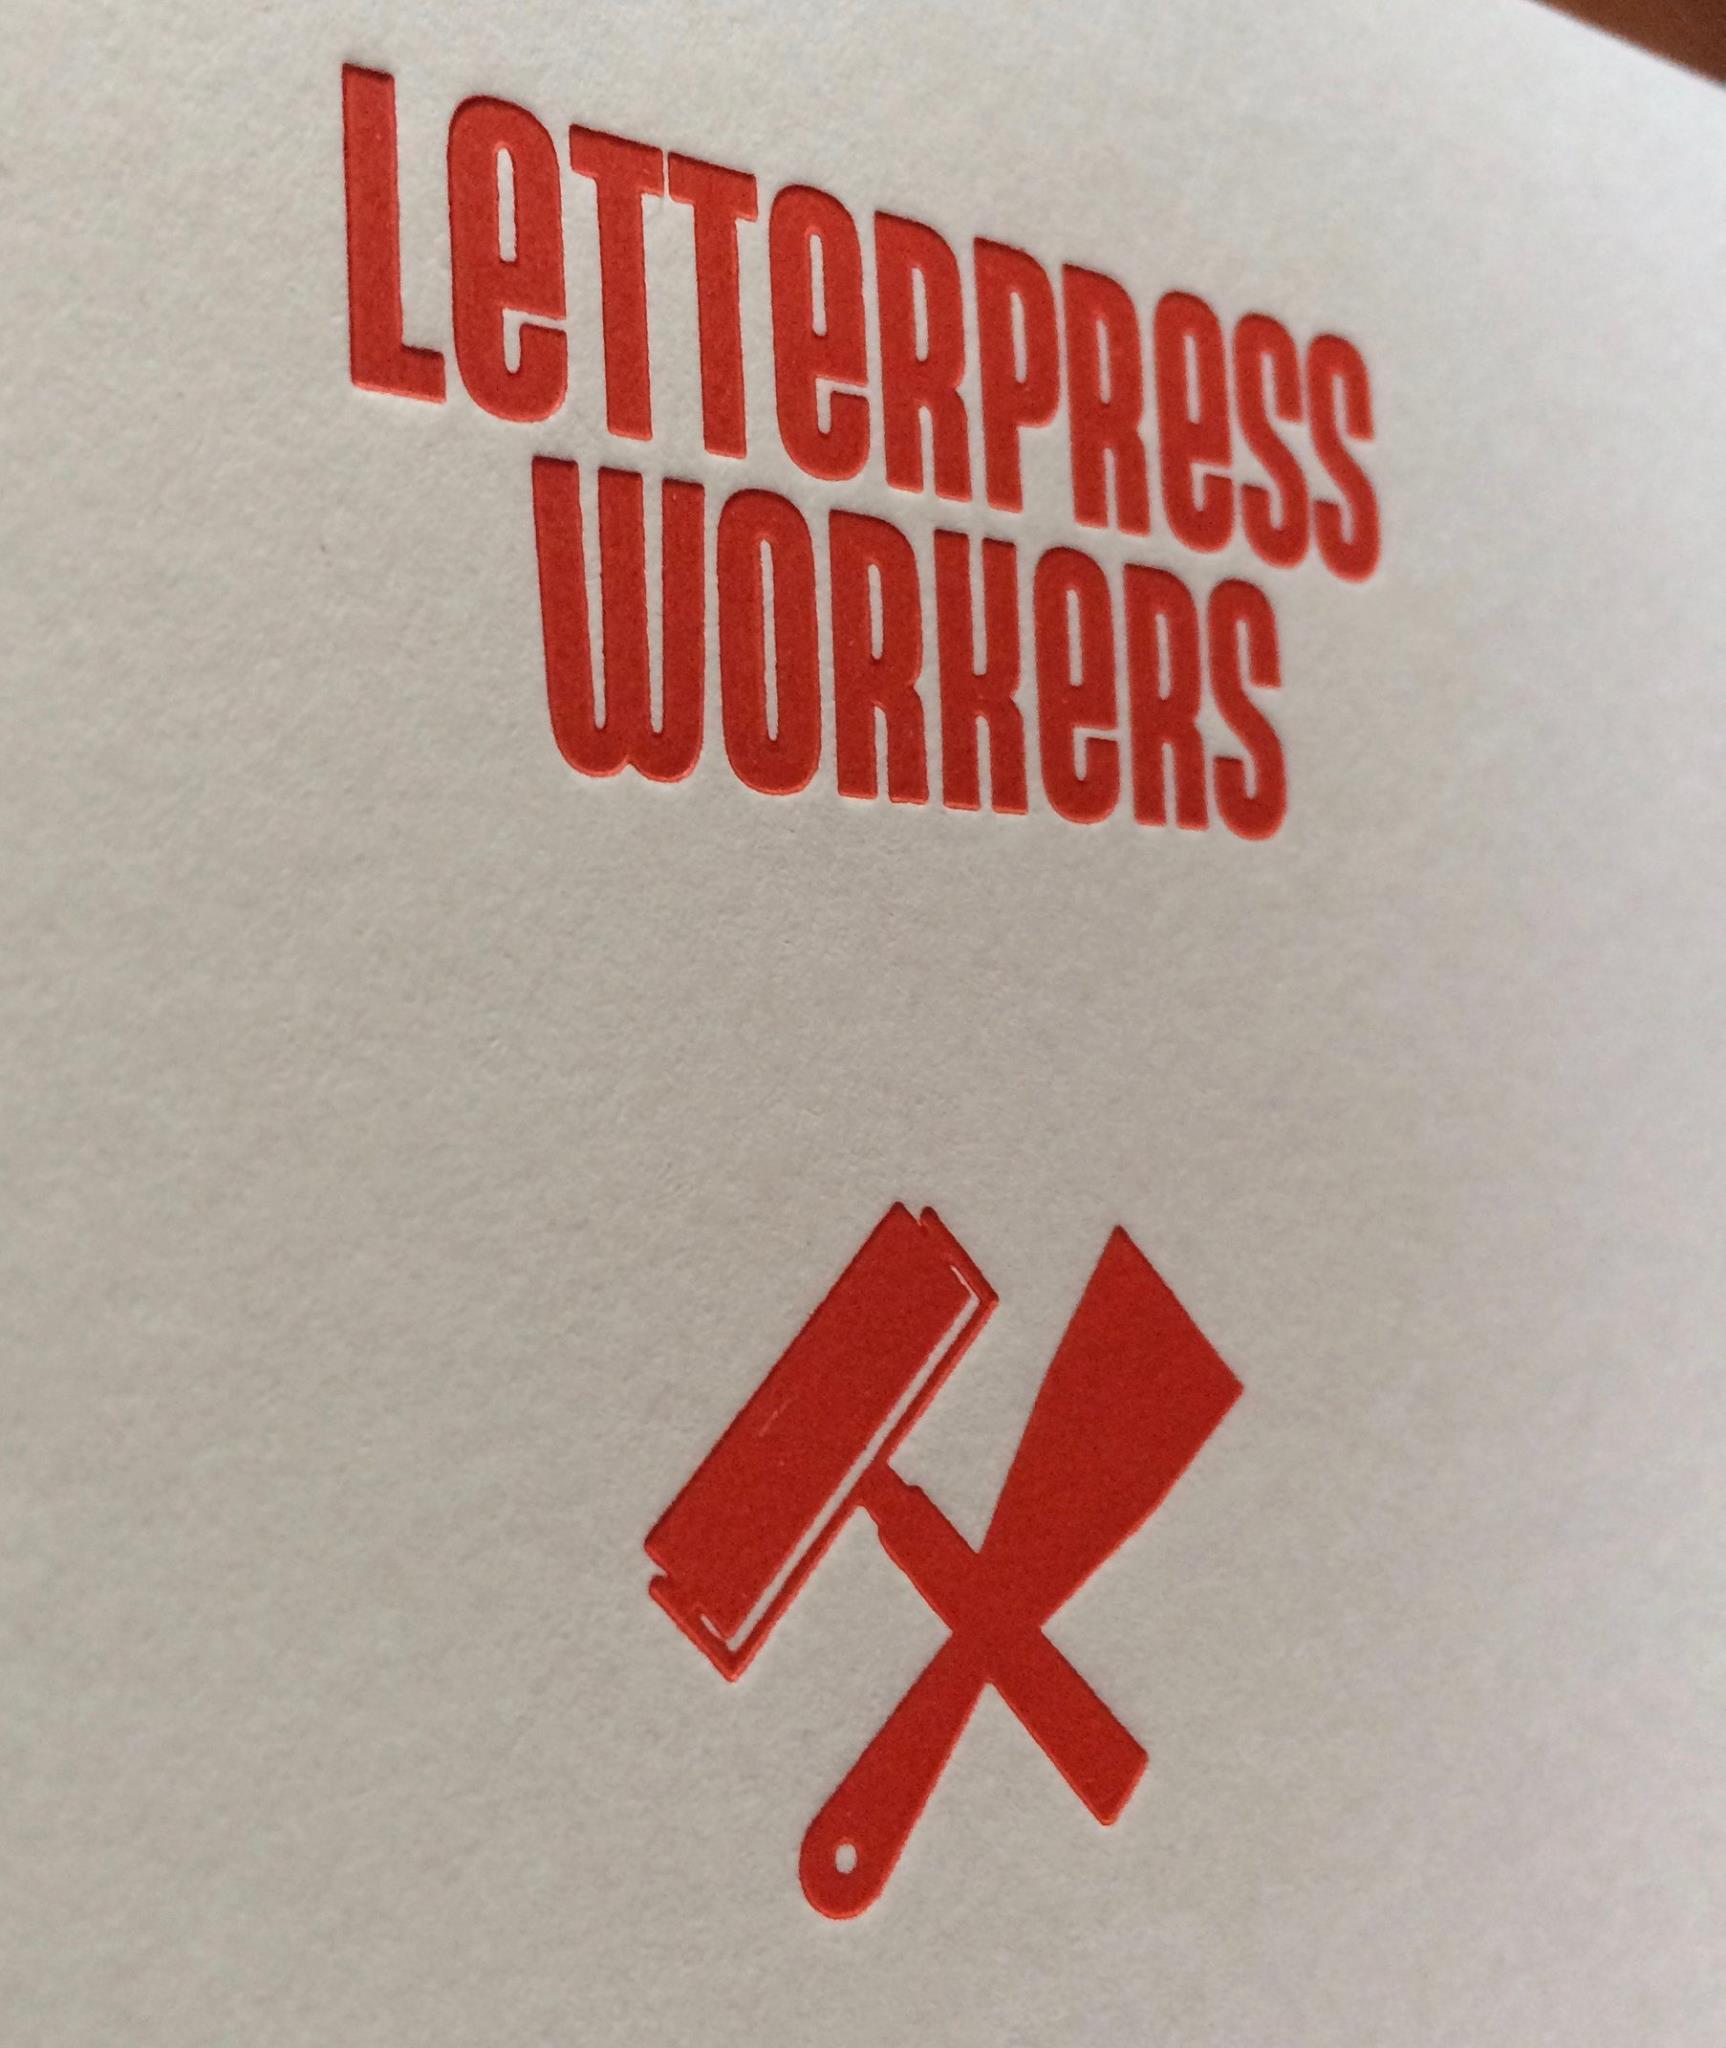 letterpress workers 2017 lazy dog 15